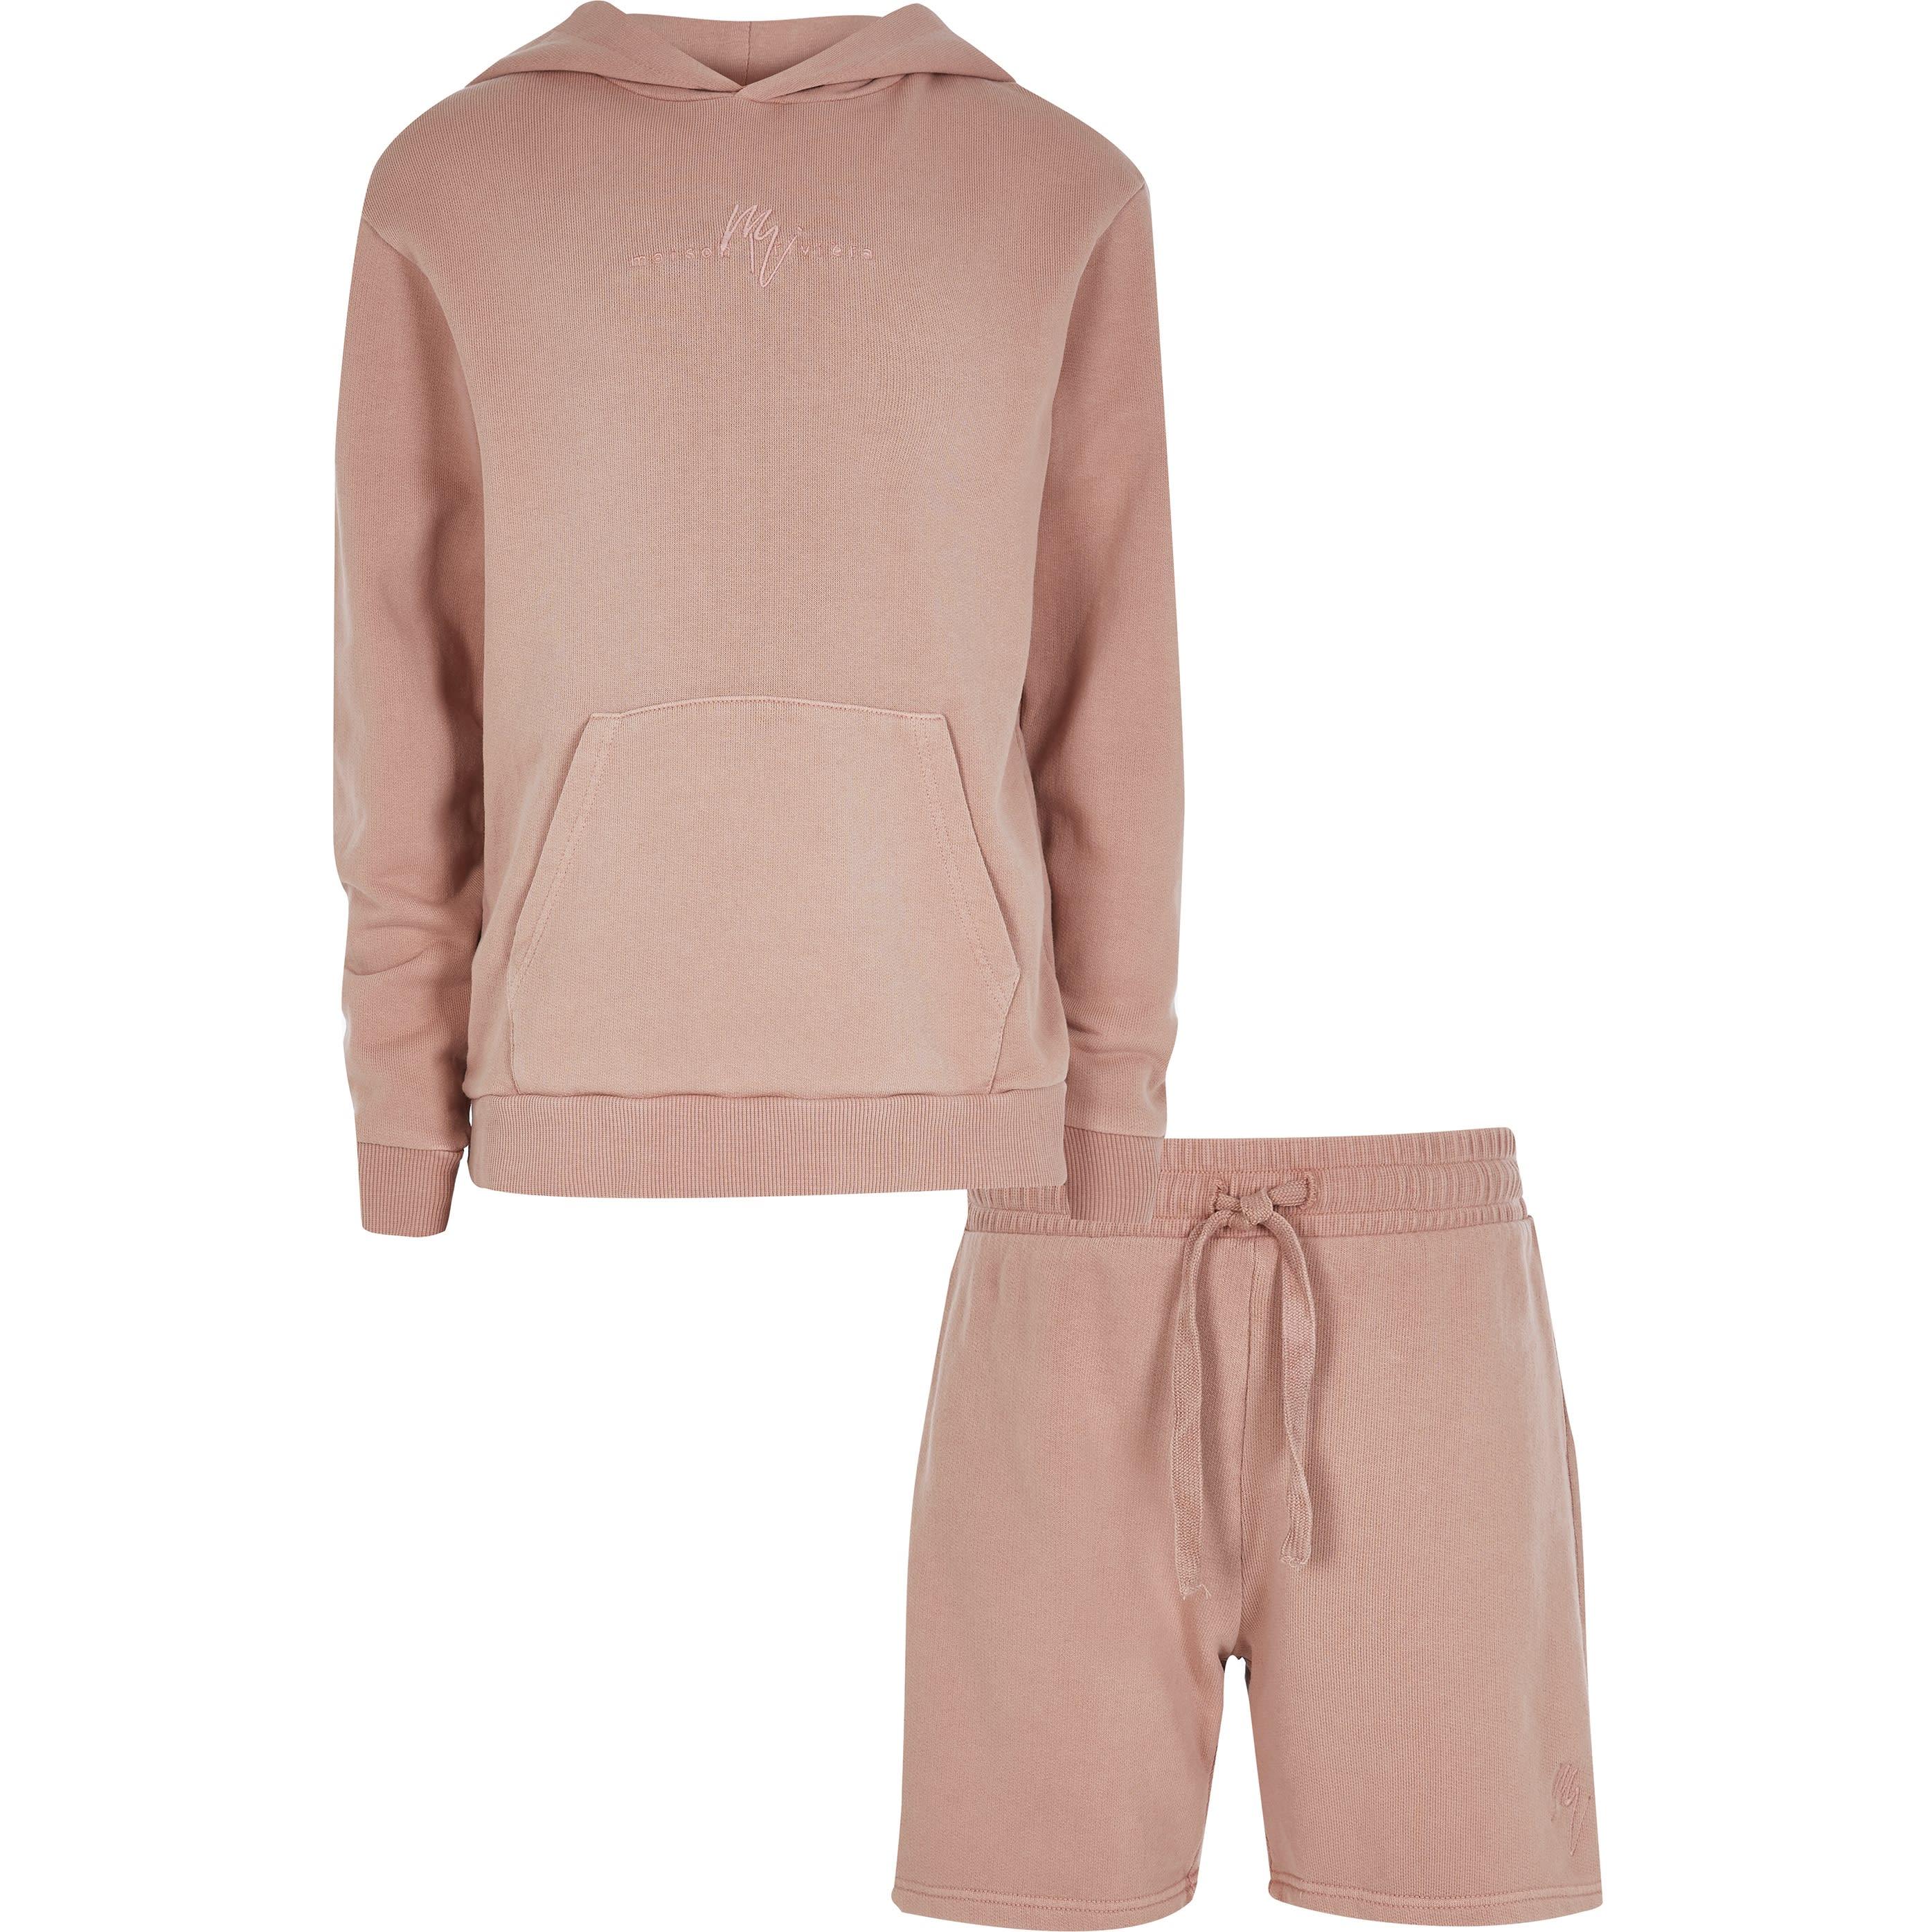 river island Boys Pink washed Hoody Set (11-12 Yrs)